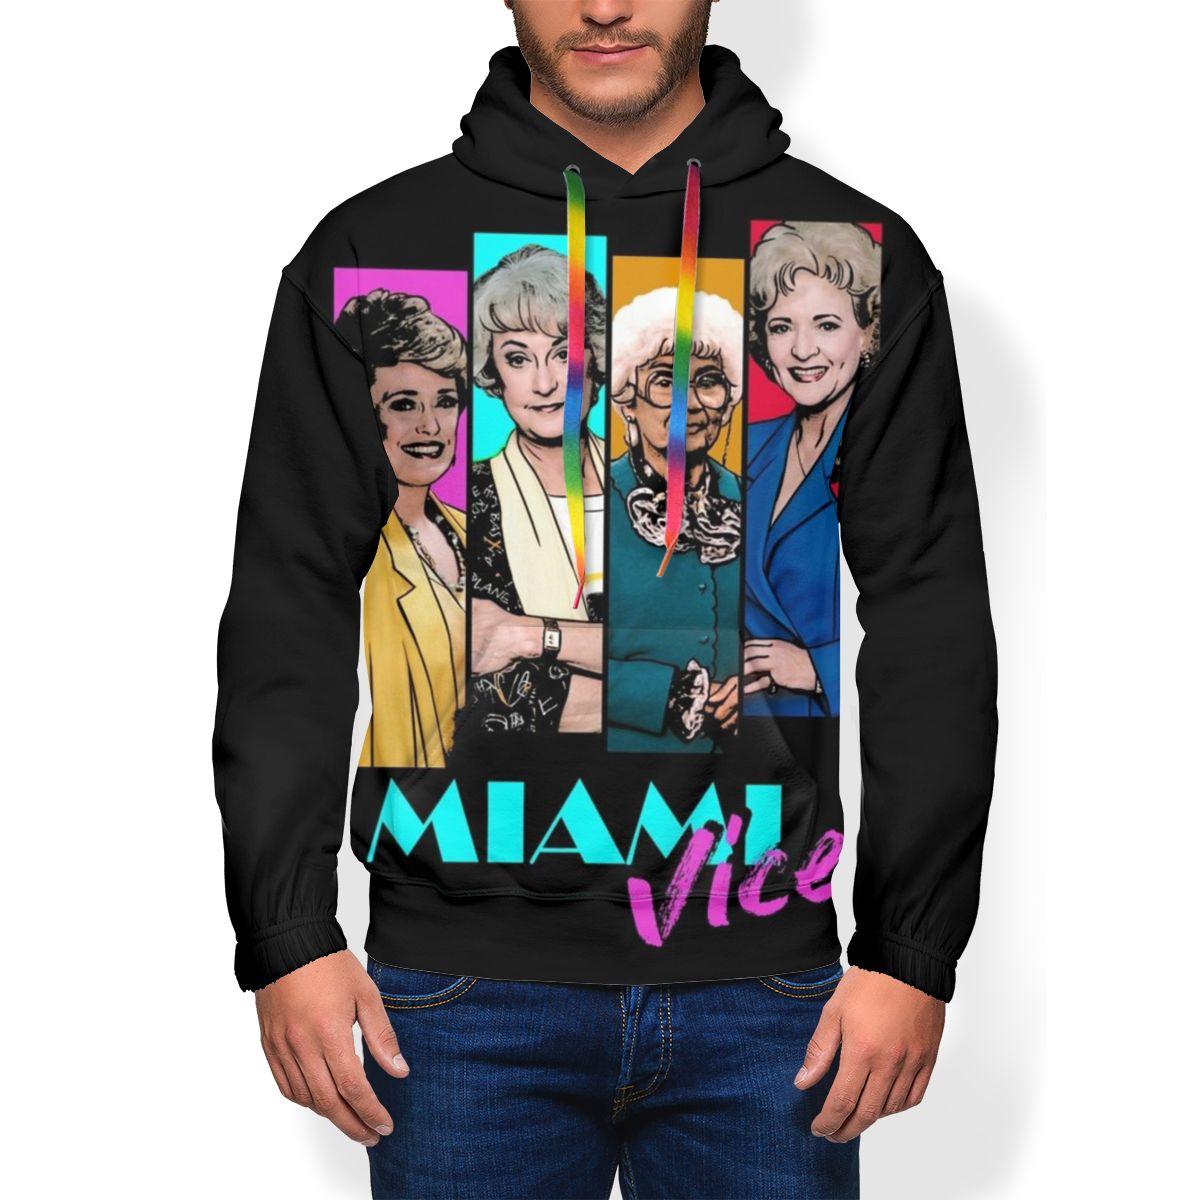 Image 2 - Golden Girls Hoodie Miami Vice Hoodies Oversize Long Length Pullover Hoodie Outdoor Polyester White HoodiesHoodies & Sweatshirts   -